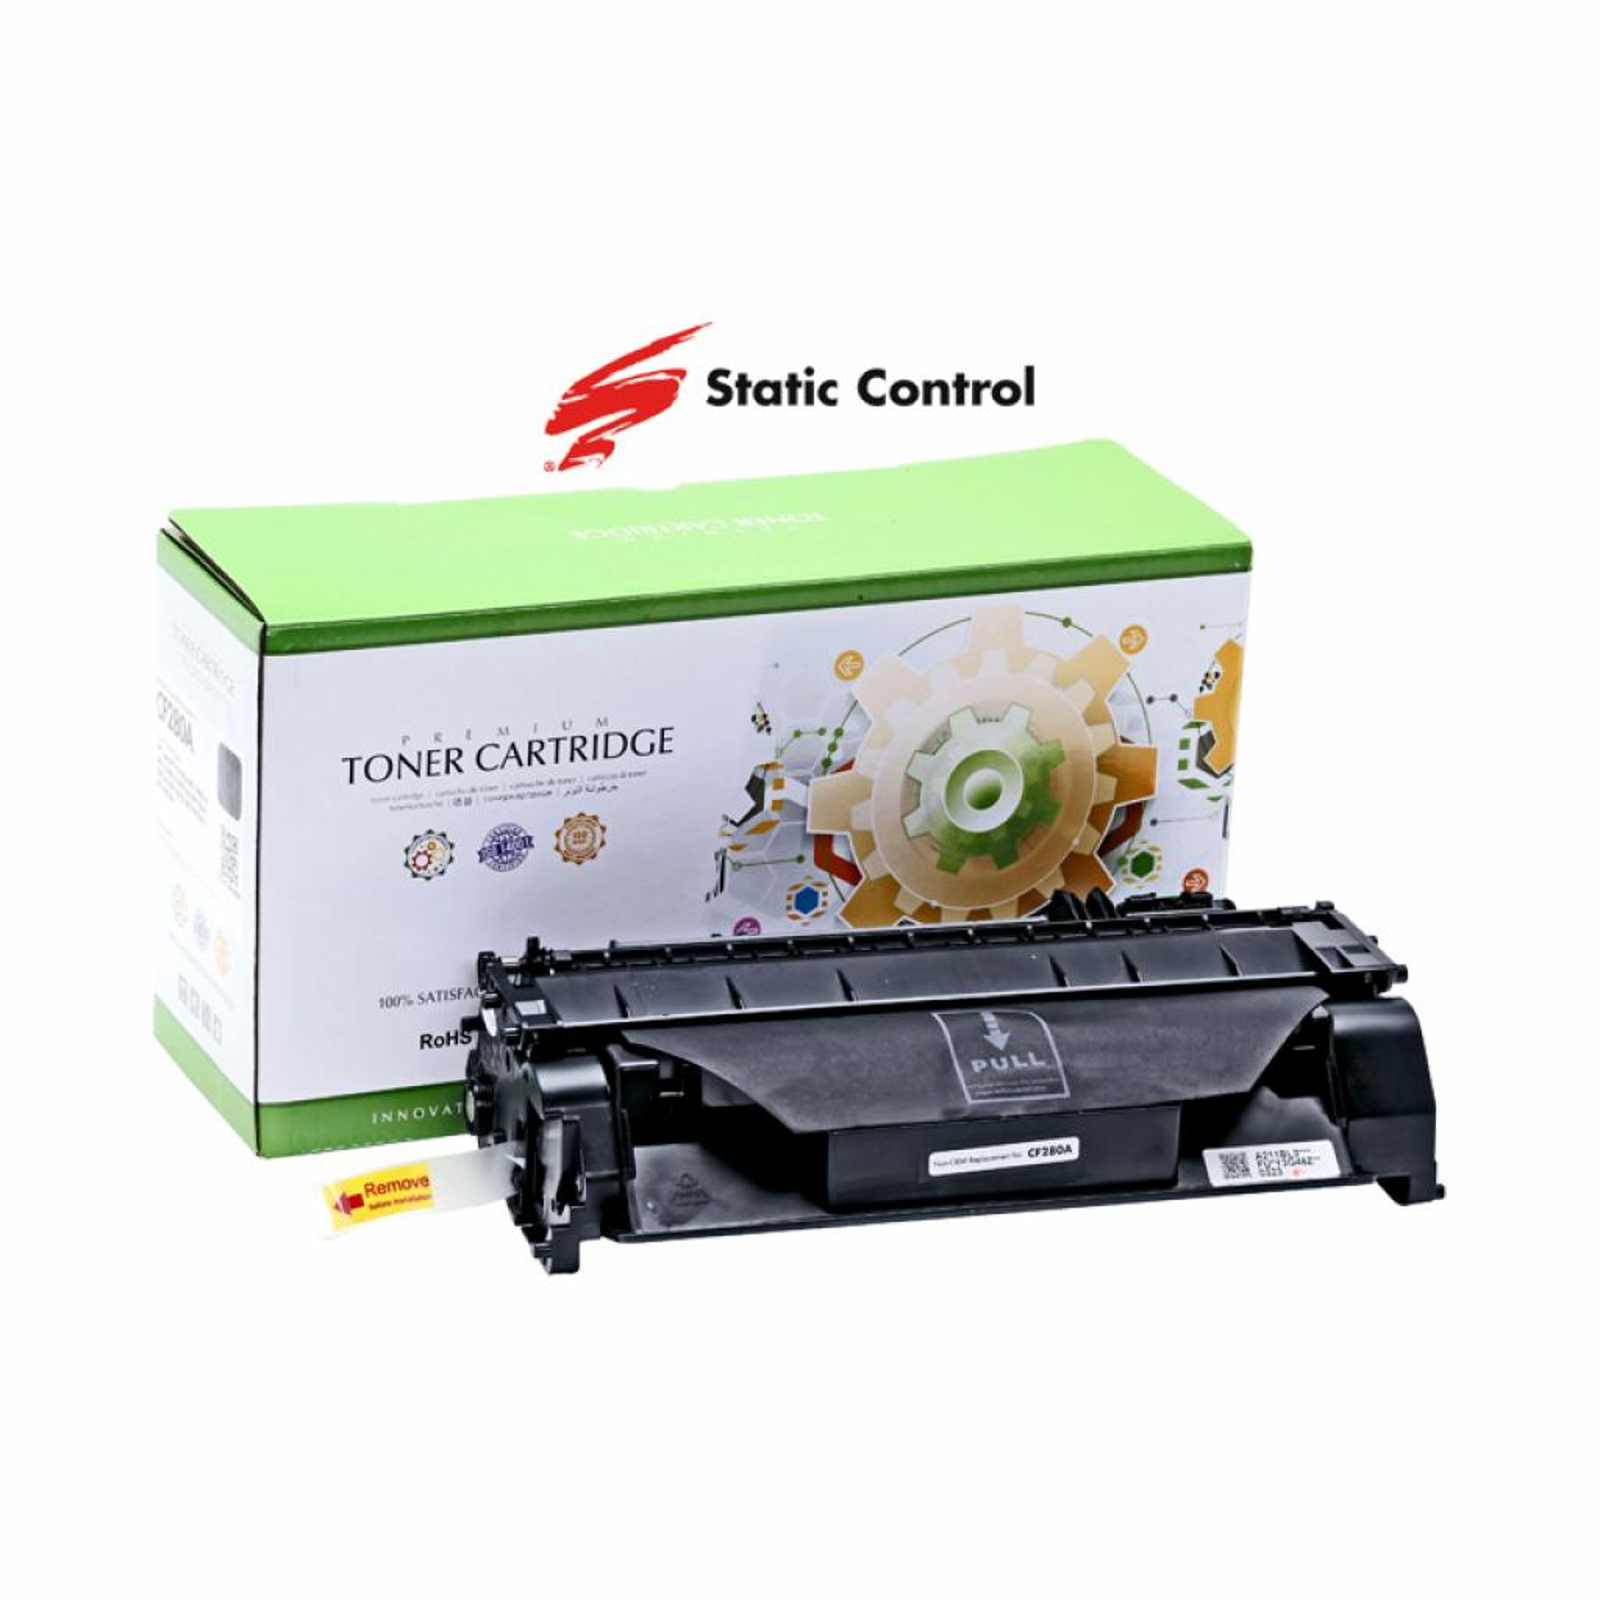 Картридж Static Control HP LJ CF280A2.7k (002-01-SF280A/002-01-VF280A)